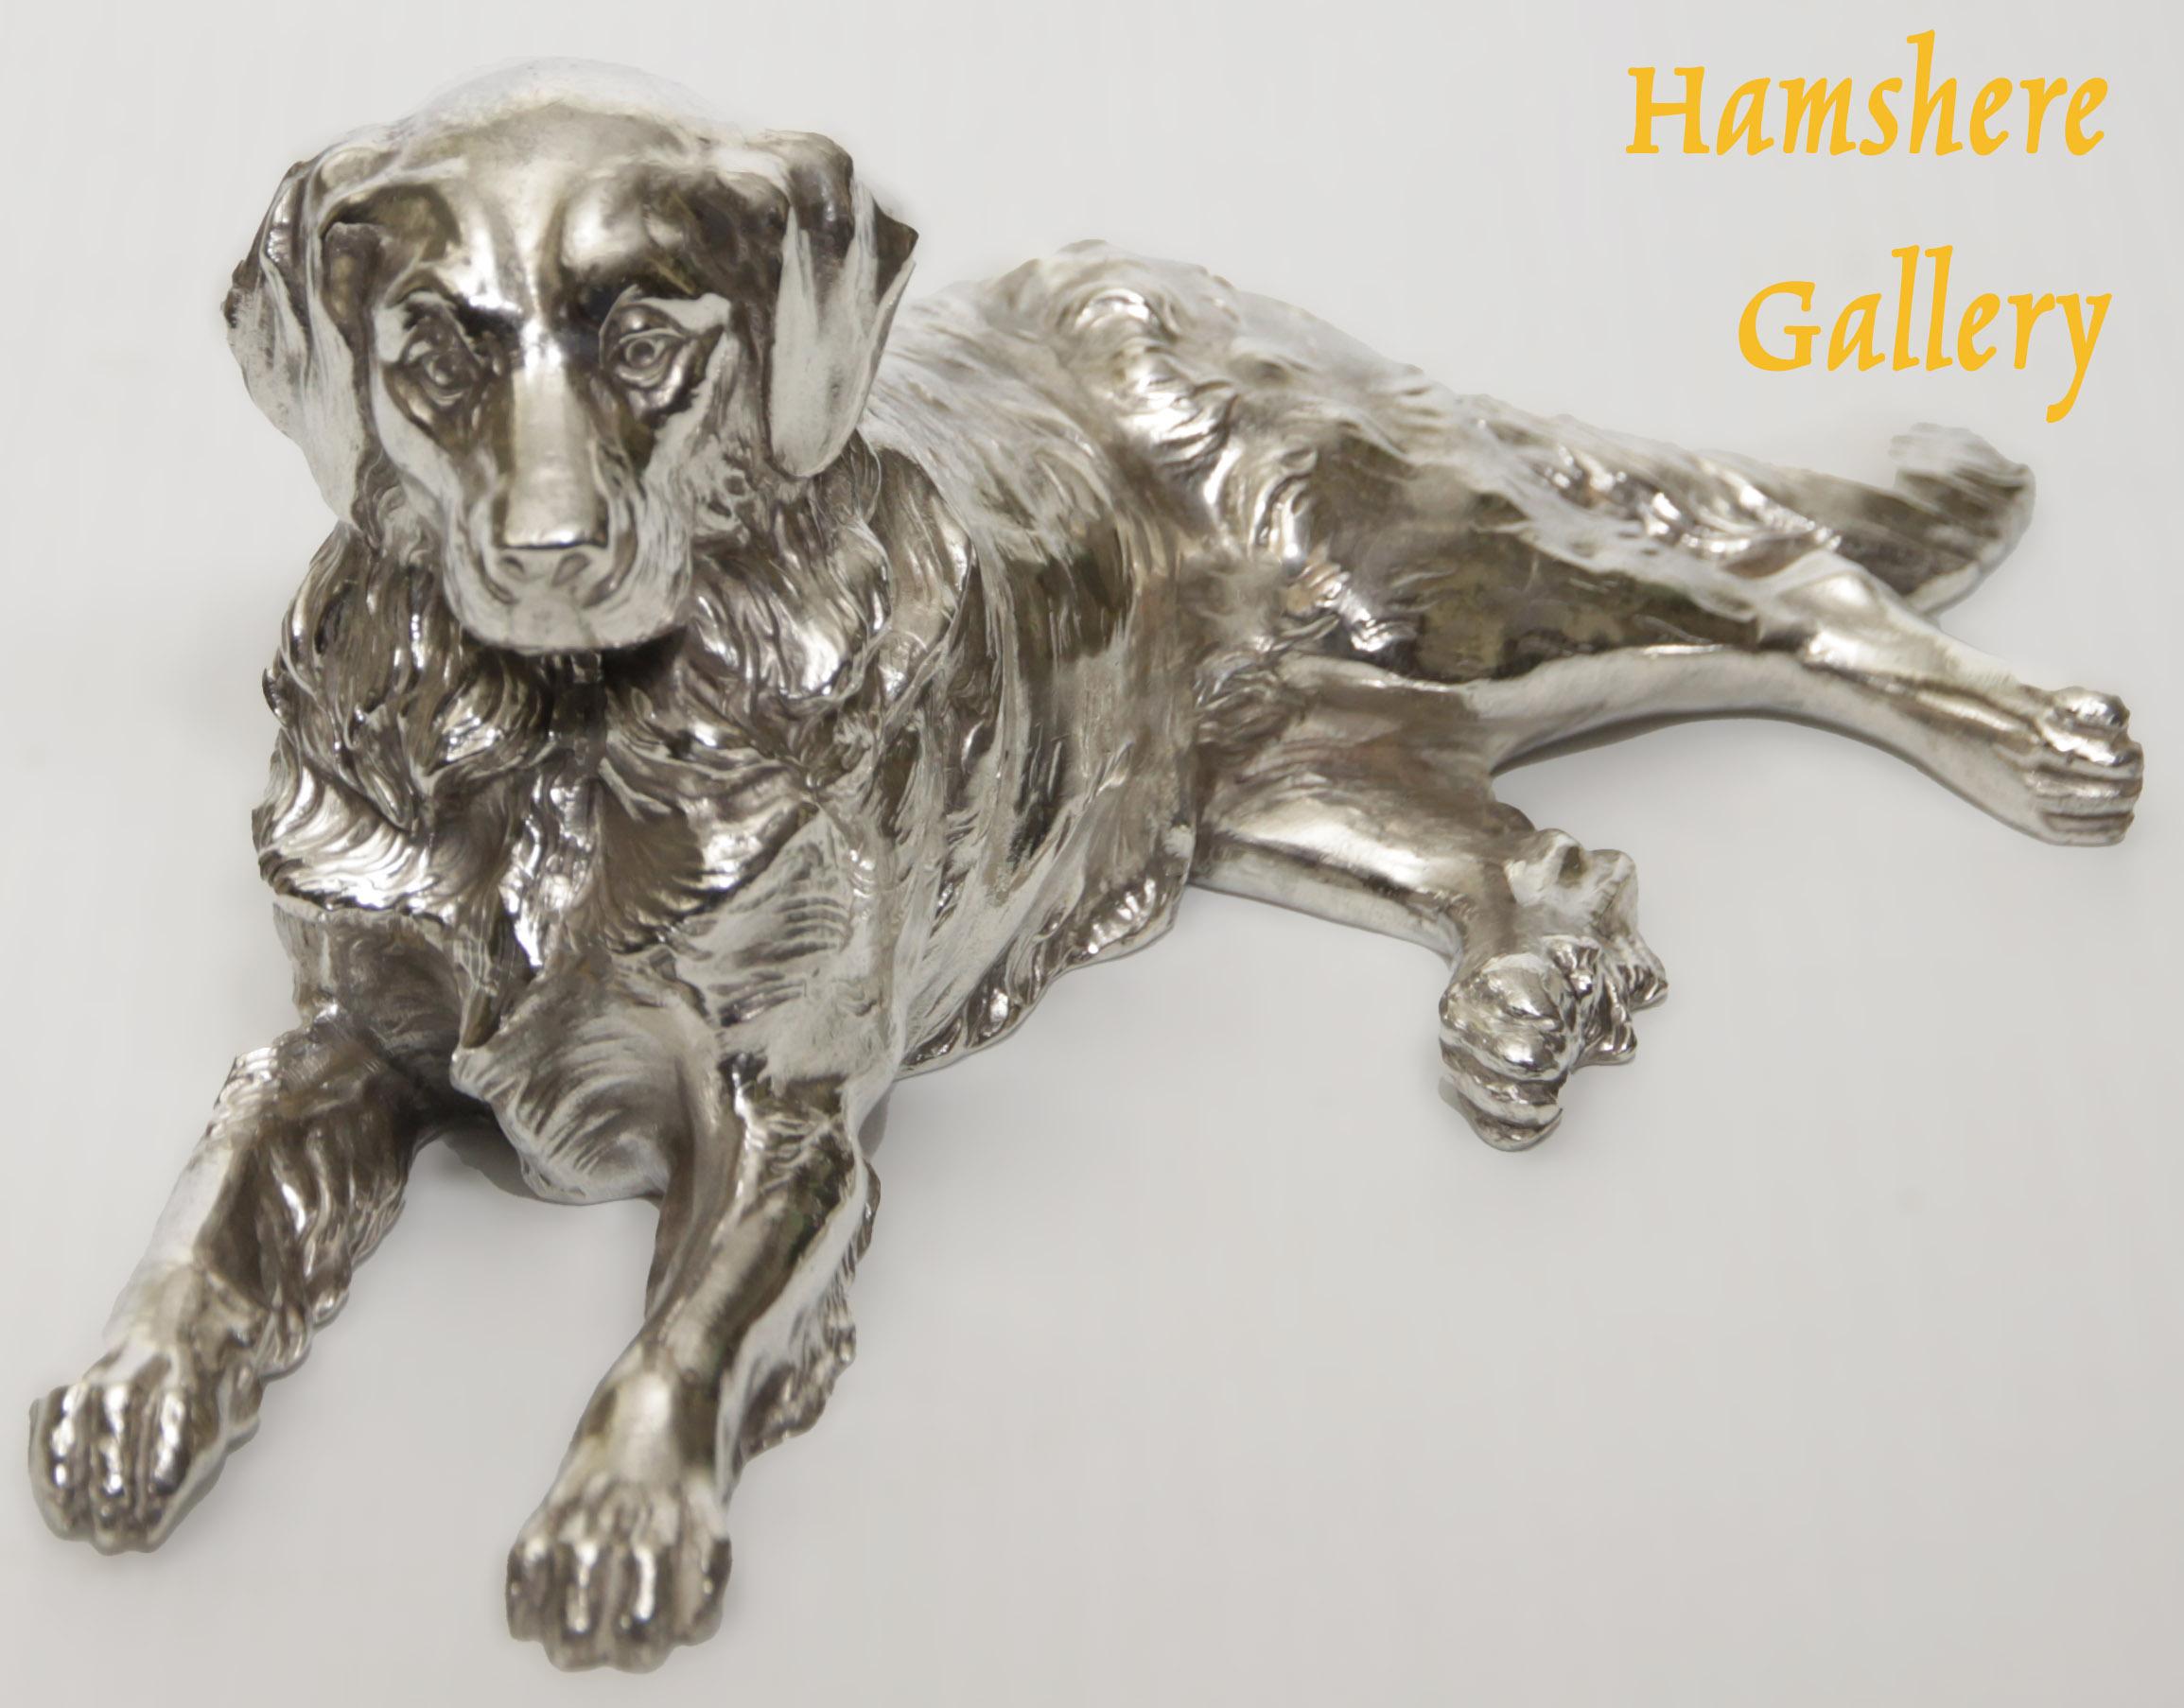 Click to see full size: Kayserzinn Bernese / St. Bernard sculpture by J.P. Kayser & Sohn AG